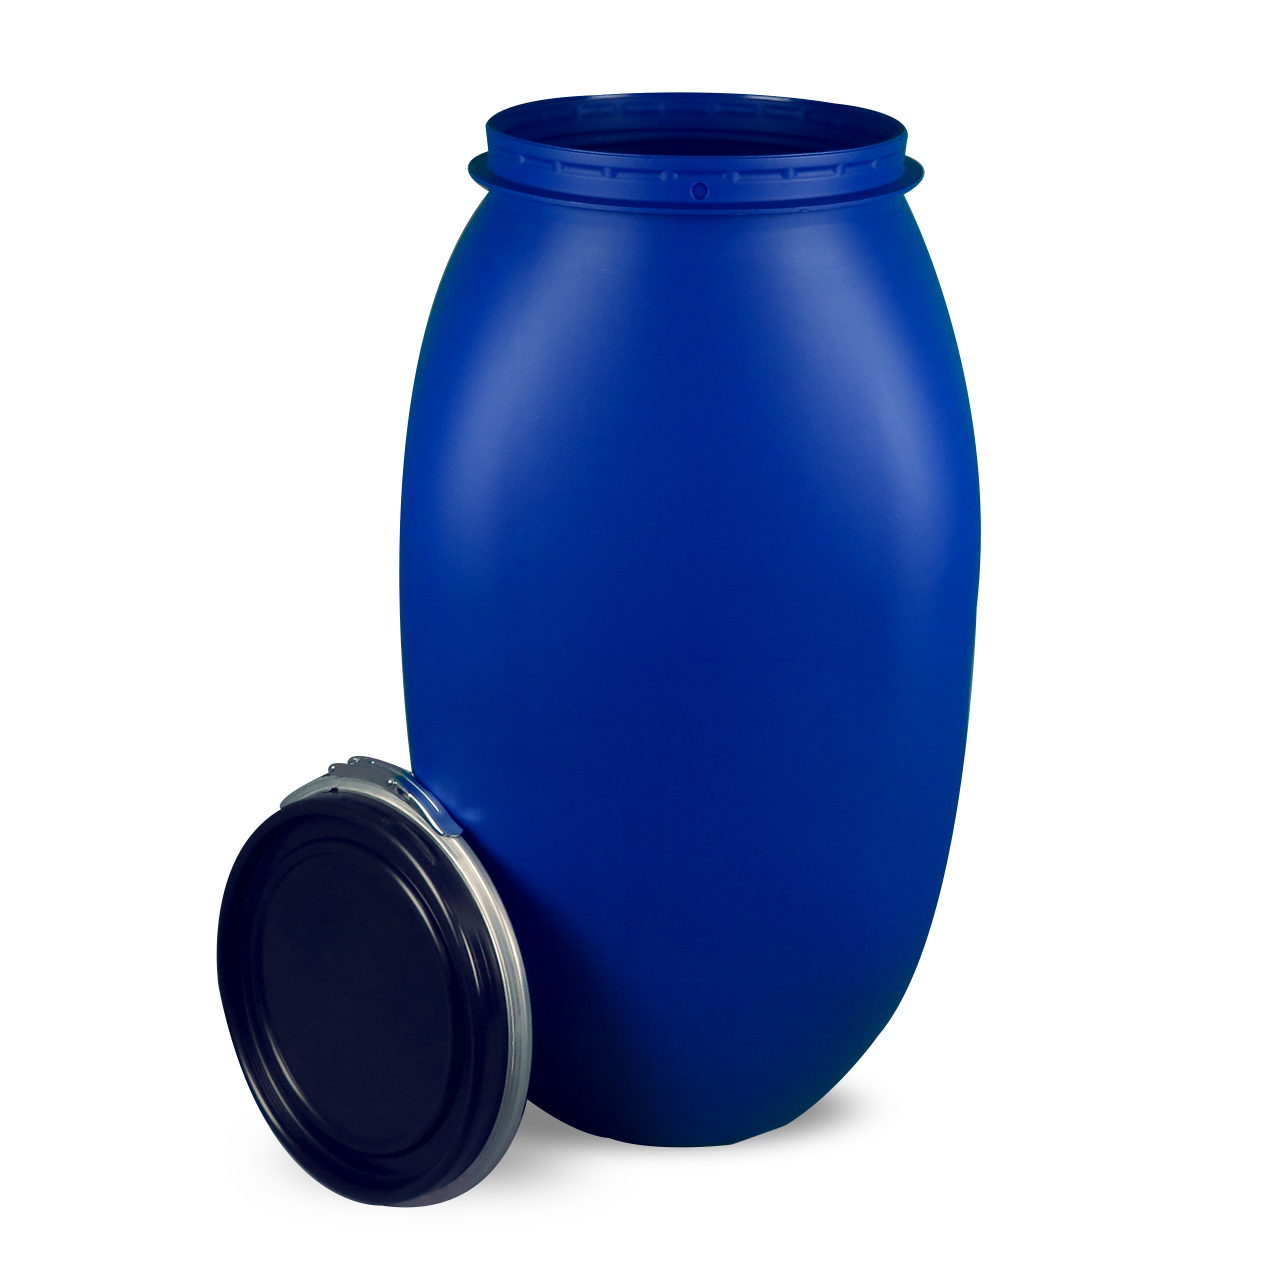 120 L Kunststoffdeckelfass, blau, eckig, palettengerecht, FDA, UN